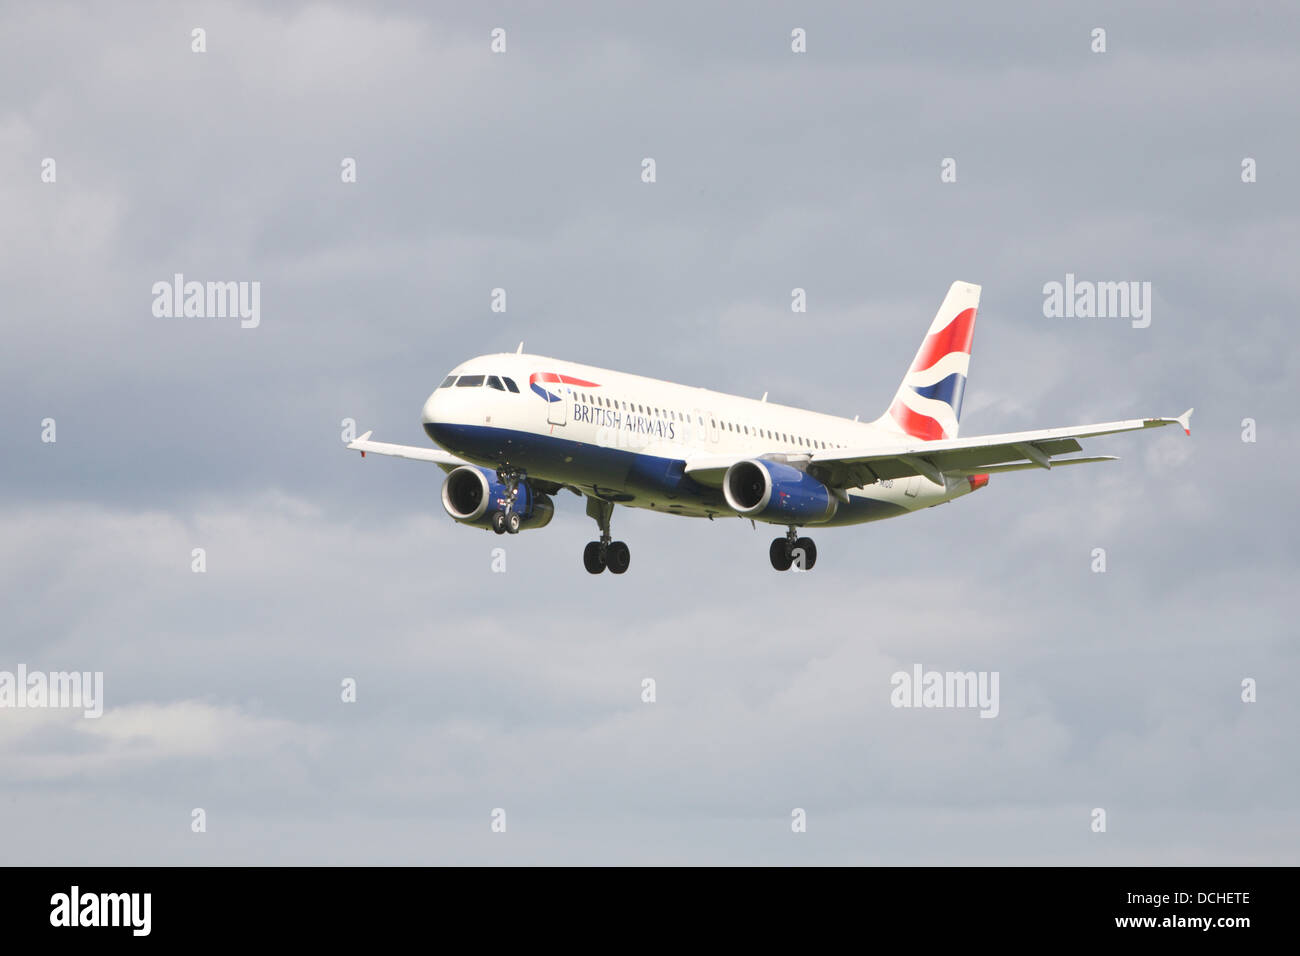 British Airways flight landing in Dublin - Stock Image